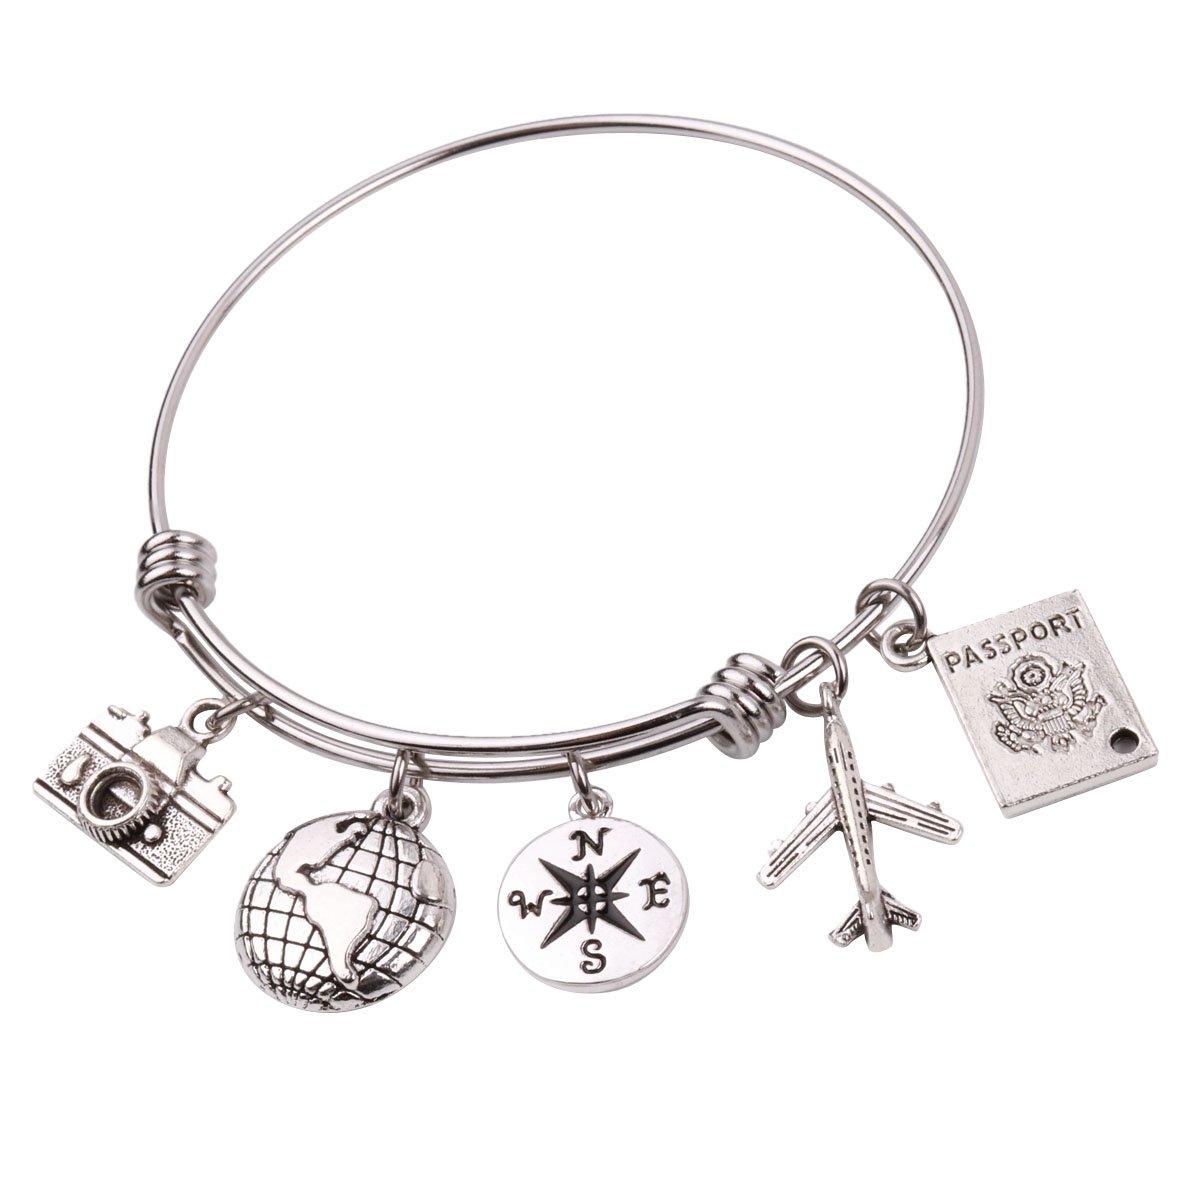 RUNXINTD Personalized Travel Bracelet Compass bangle bracelet Passport Bracelet Gift For Traveler (Silver Bangle Bracelet)